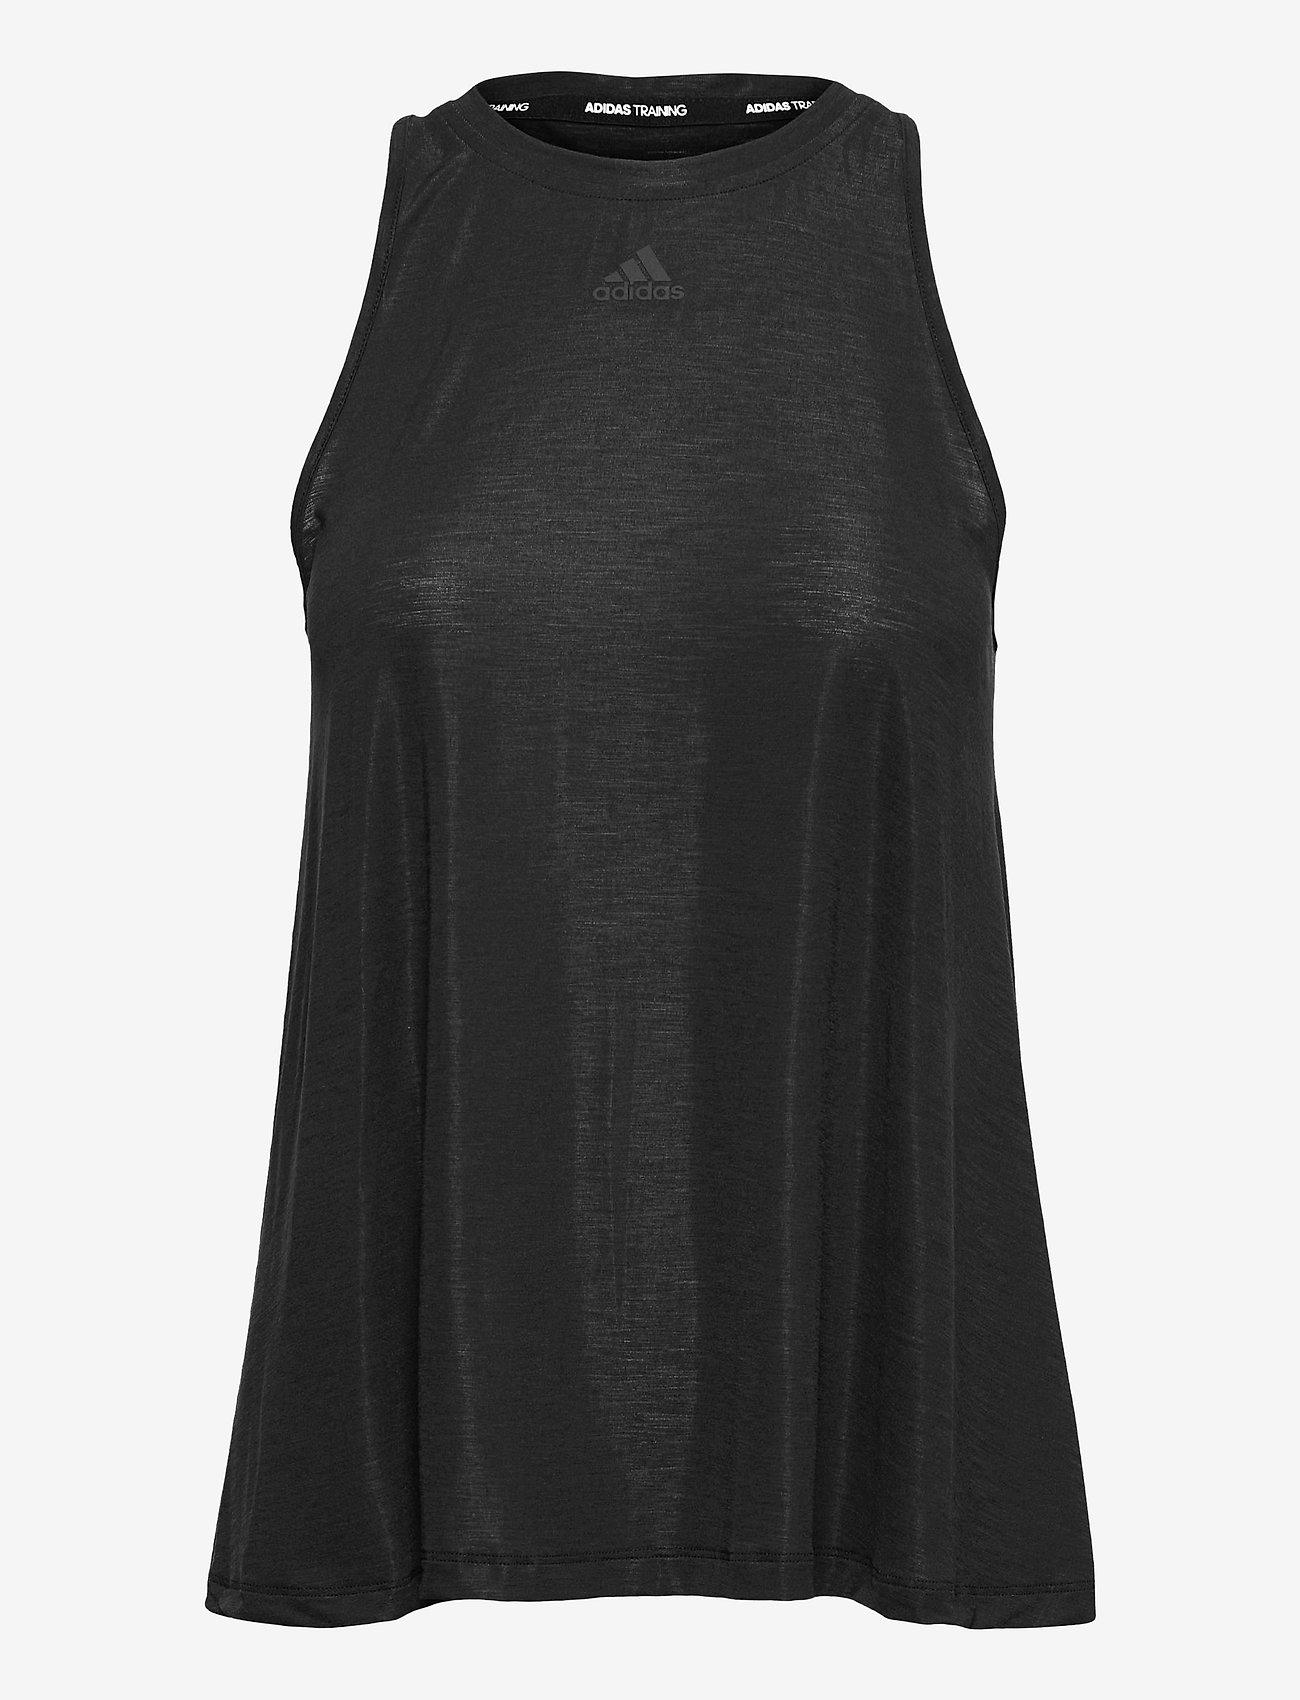 adidas Performance - Dance Tank Top W - tank tops - black/clear - 1